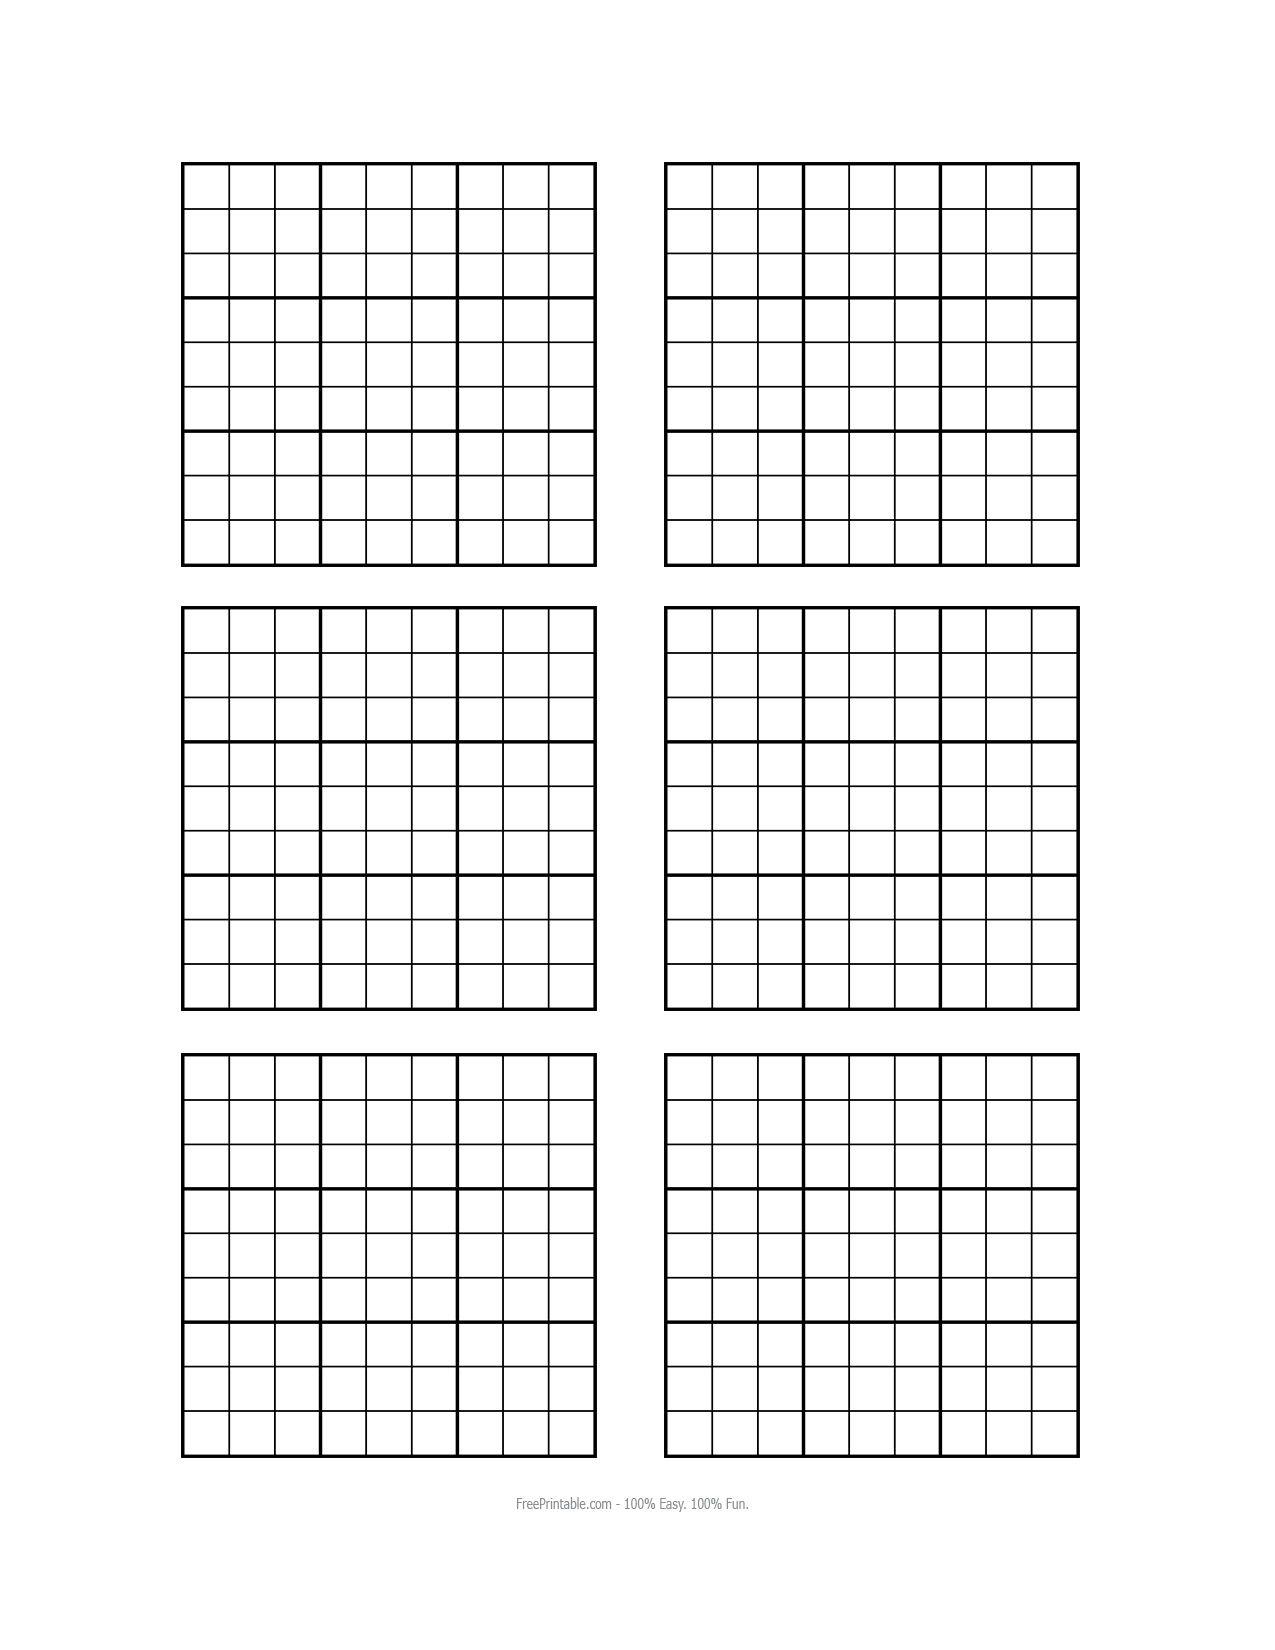 Free Printable Blank Sudoku Grids | Misc Stuff | Grid Paper | Printable Grids Worksheets